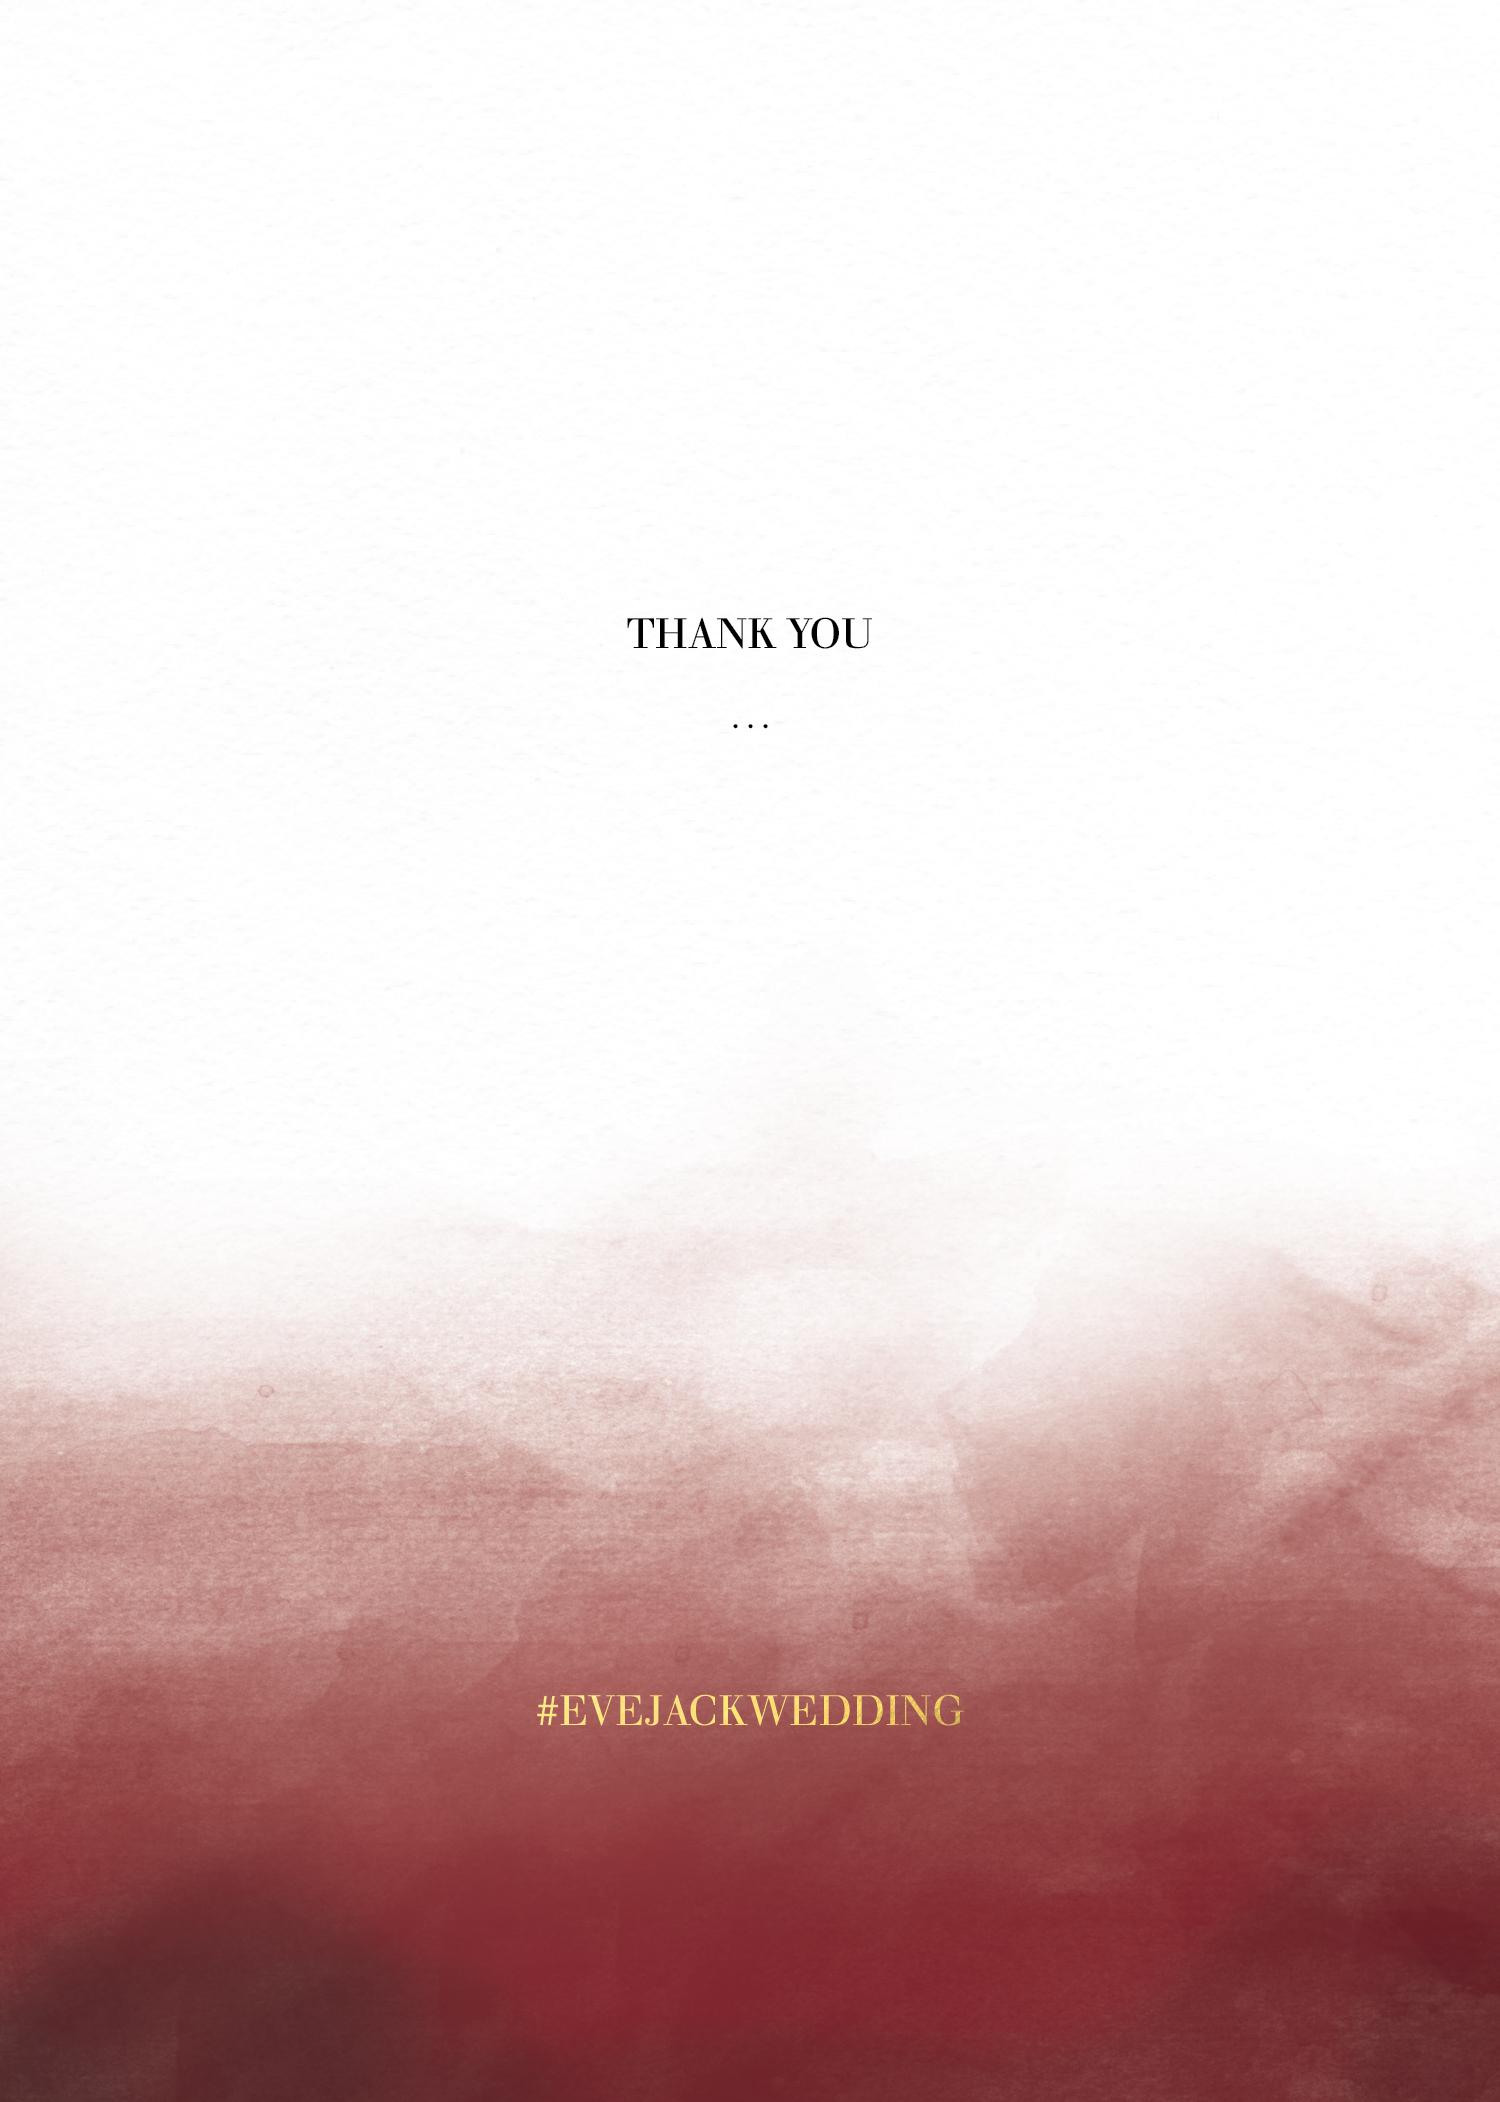 Maroon Love - Thank You